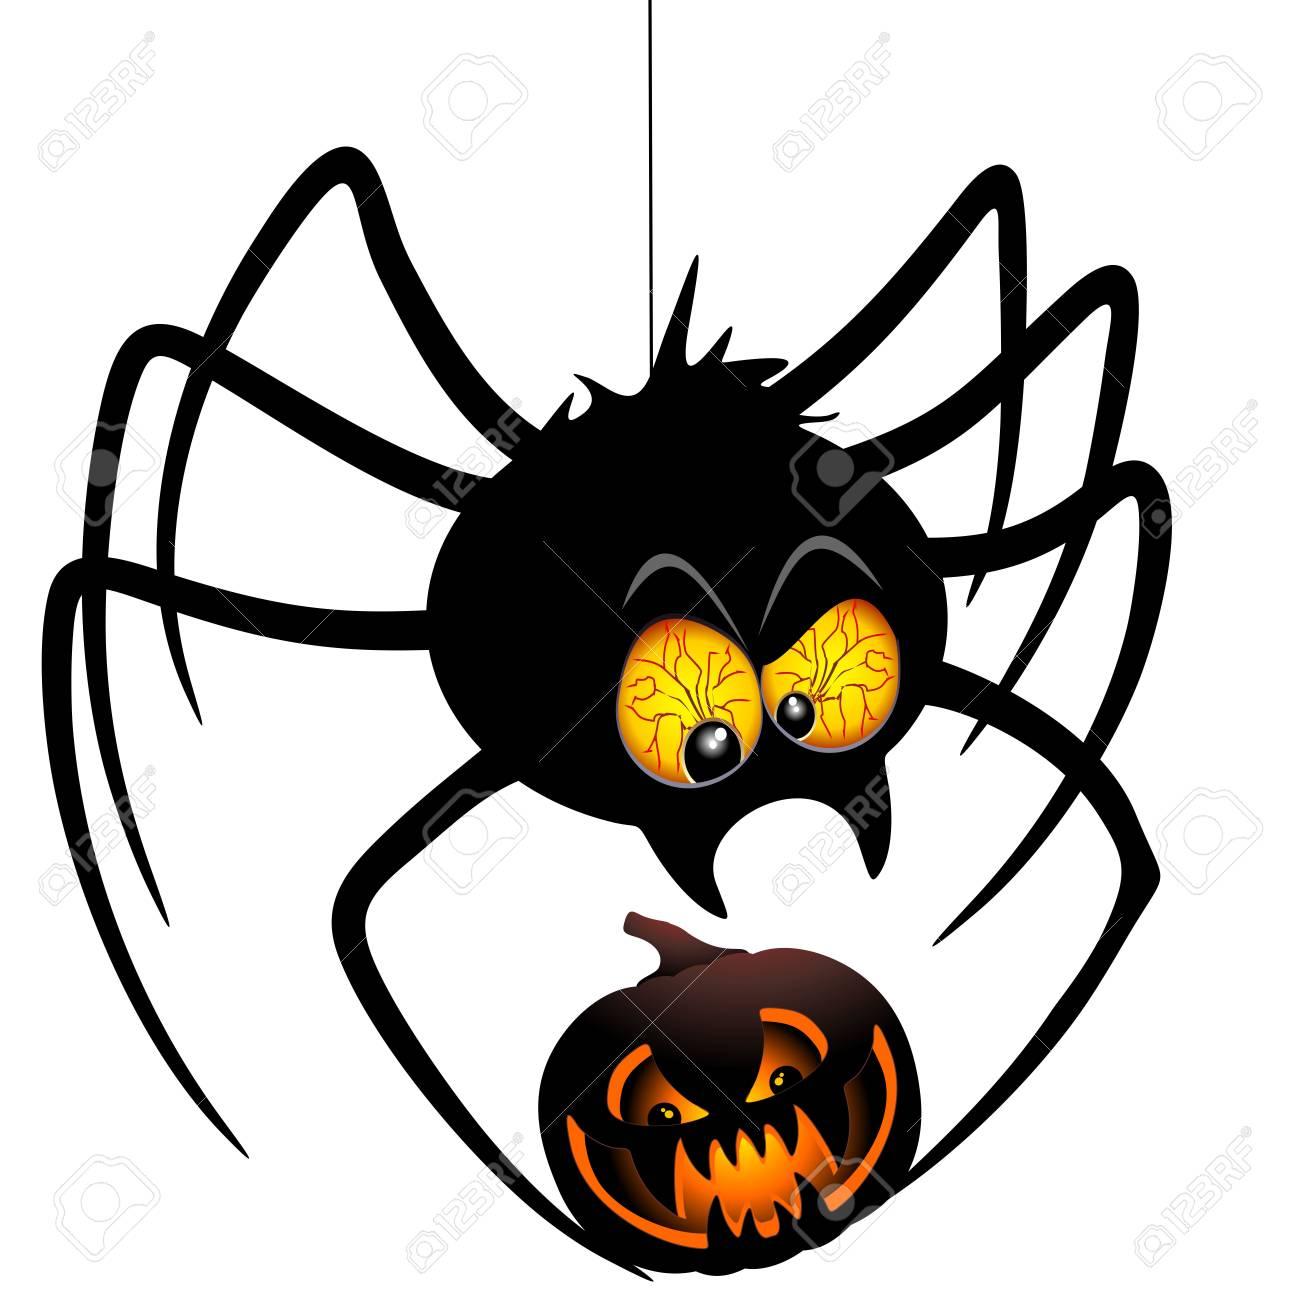 Image Araignée Halloween dessin de l'araignée de halloween tenant une citrouille clip art